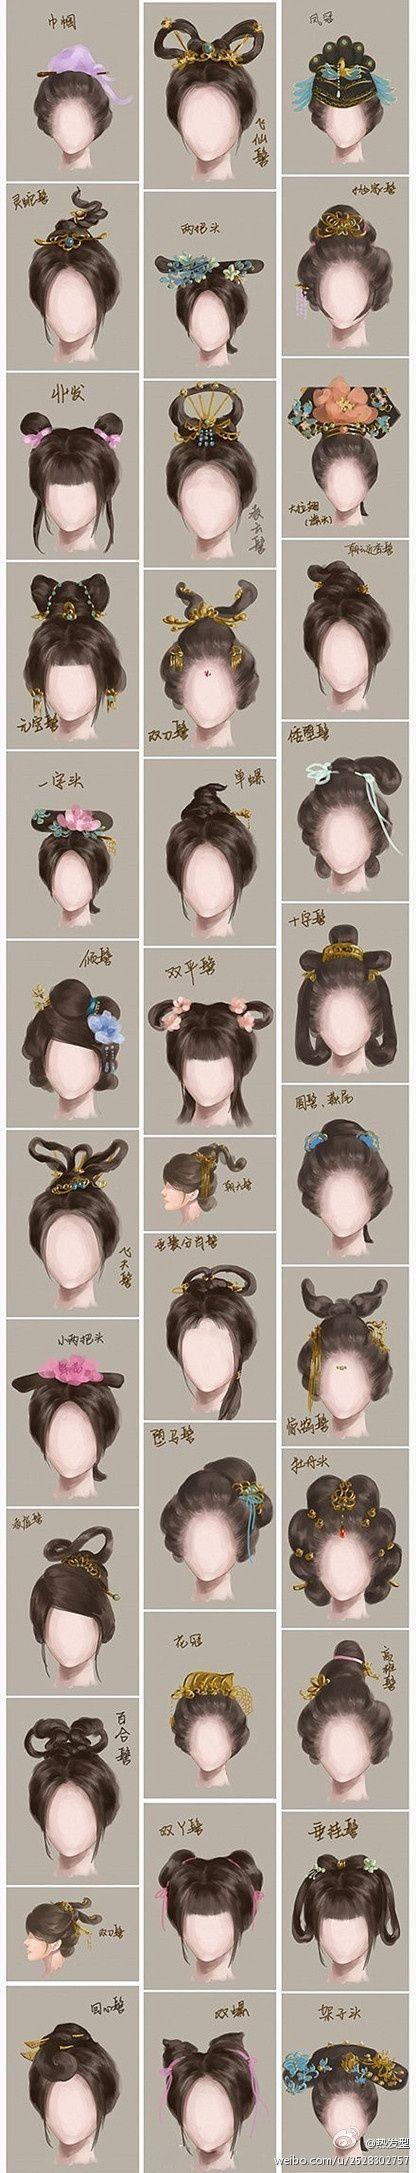 Beautiful Asian hairstyles   AHHH! Amazing!   <3